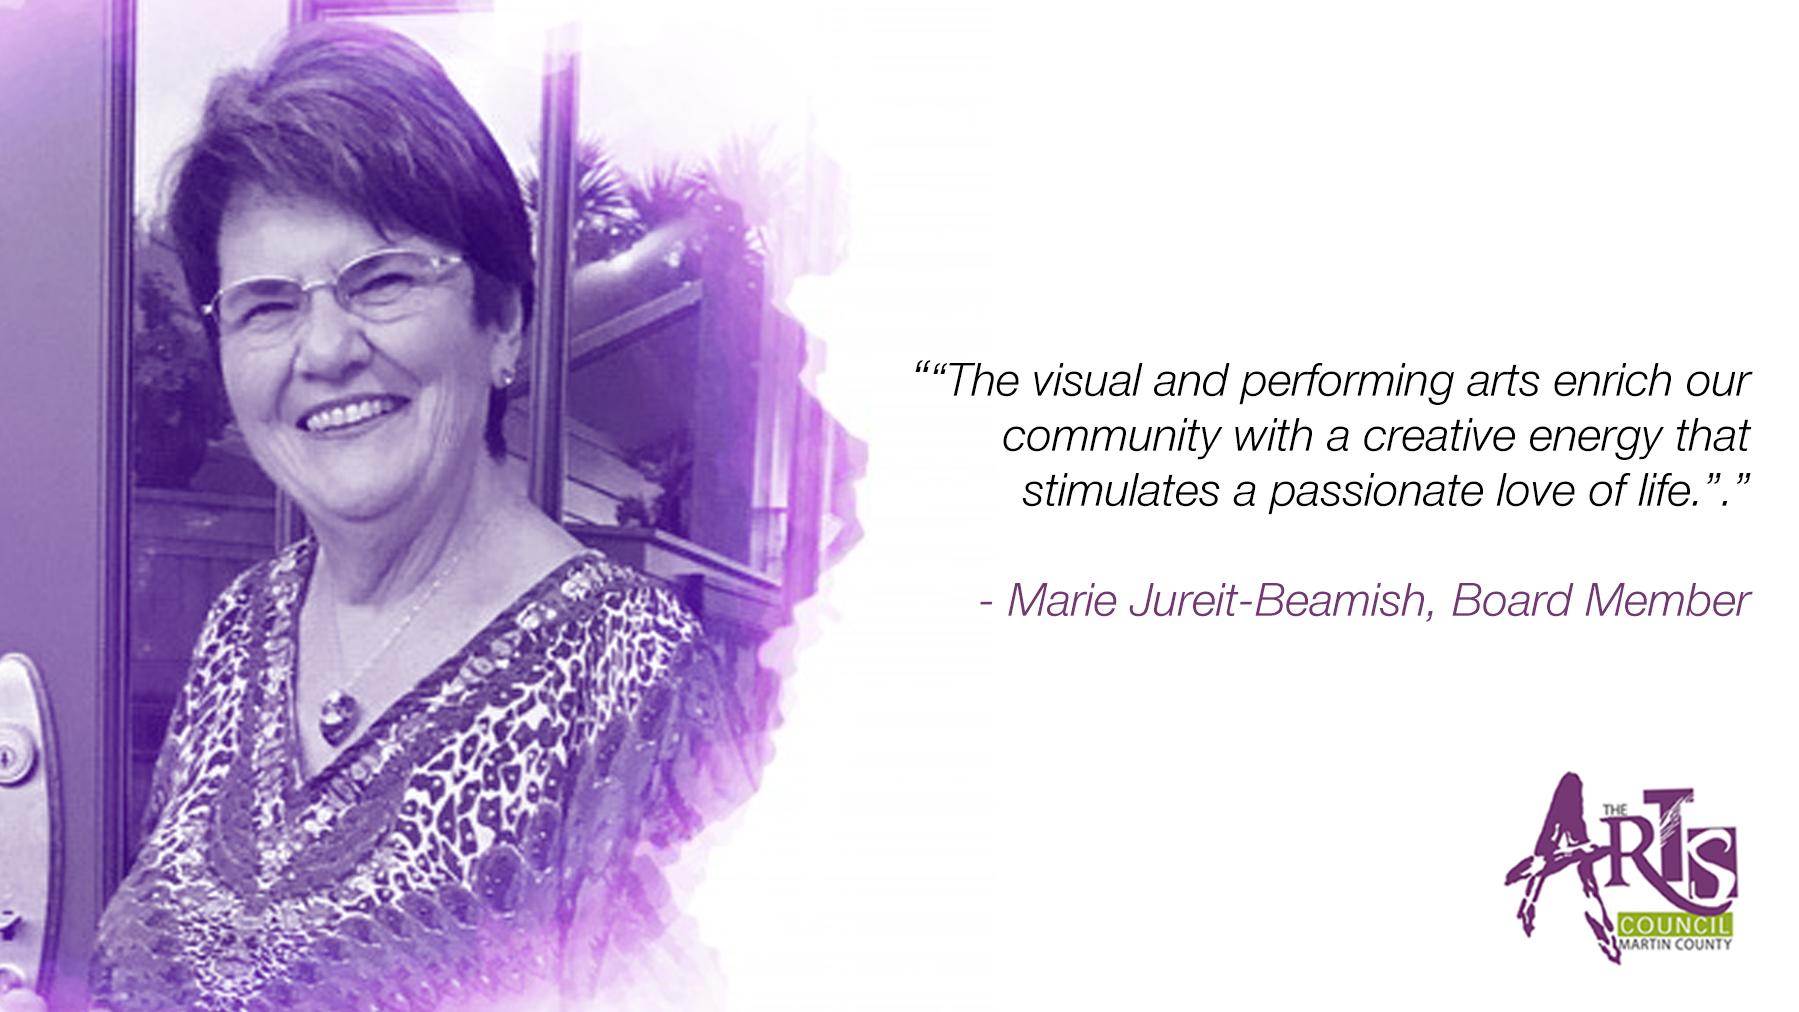 Marie Jureit-Beamish